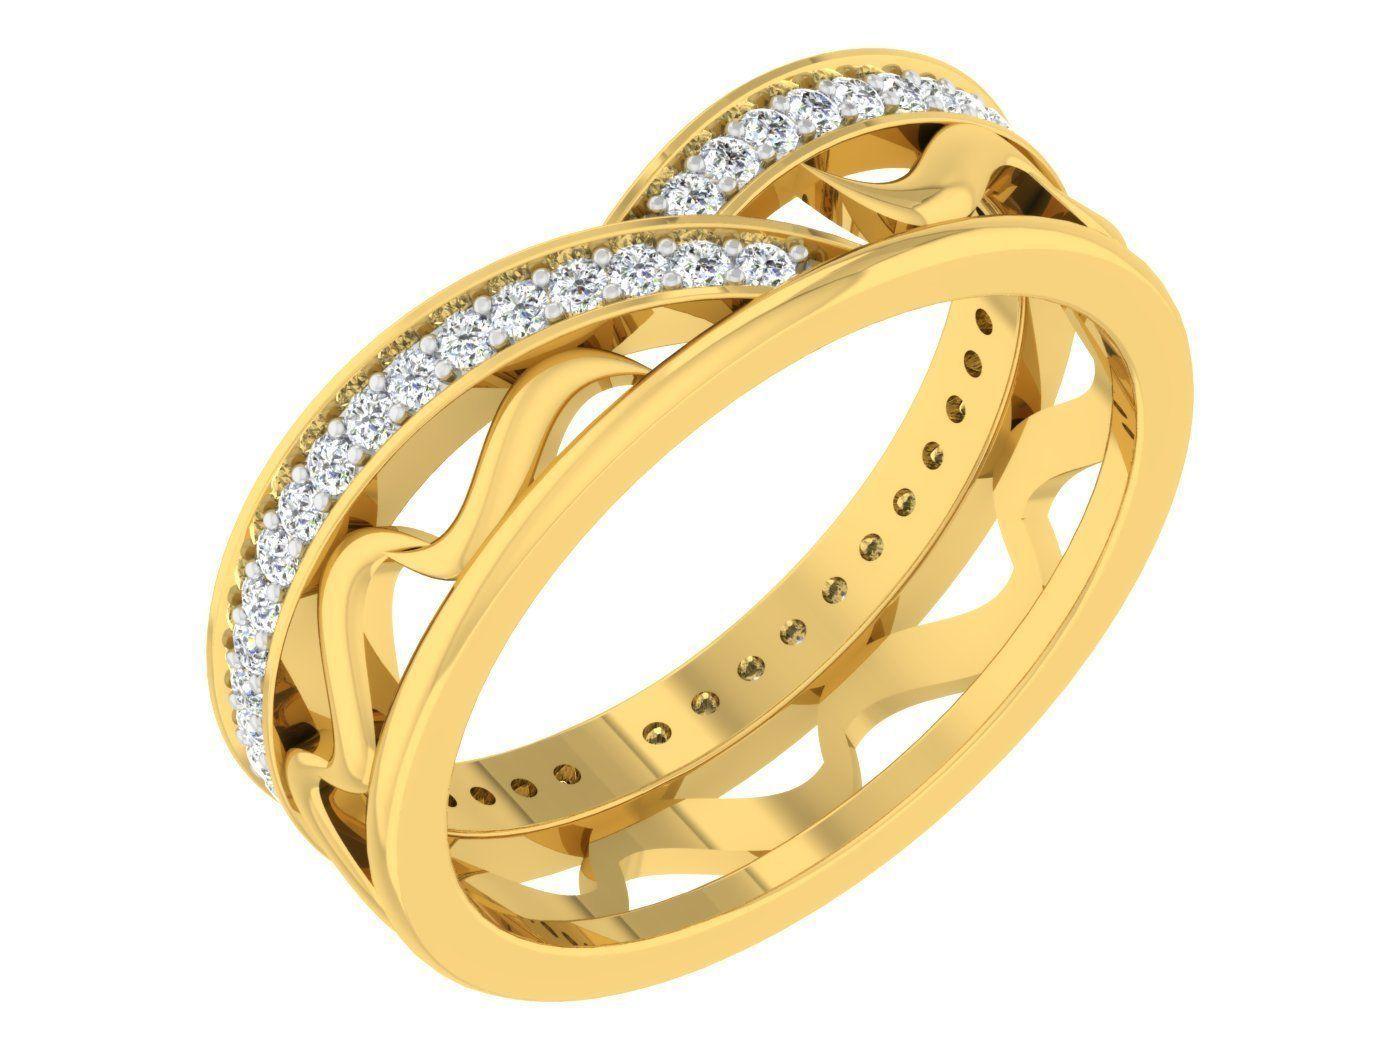 Women Band Ring 3dm stl render detail model view